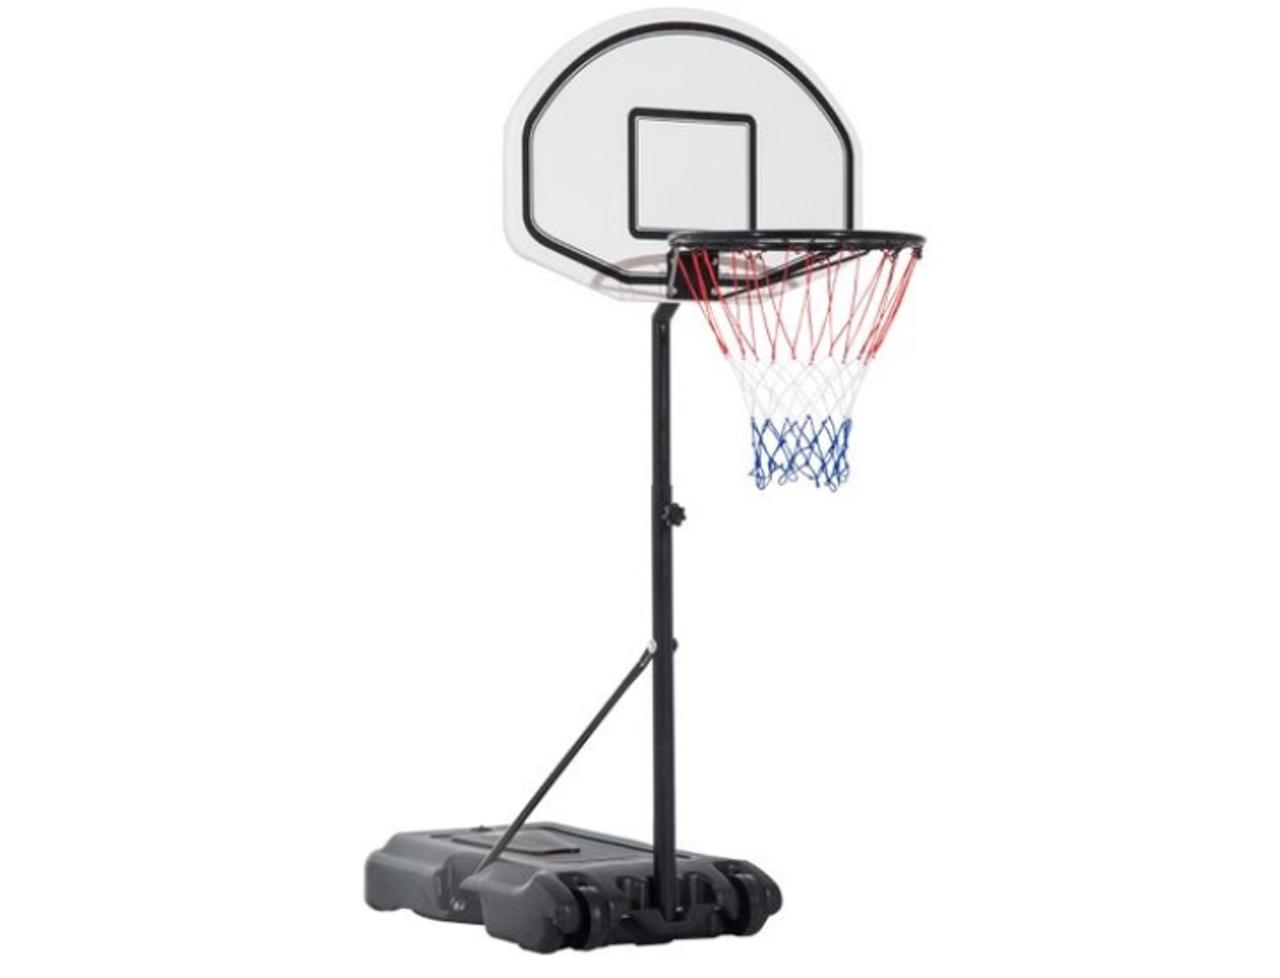 Portable Basketball Hoop for Swimming Pool